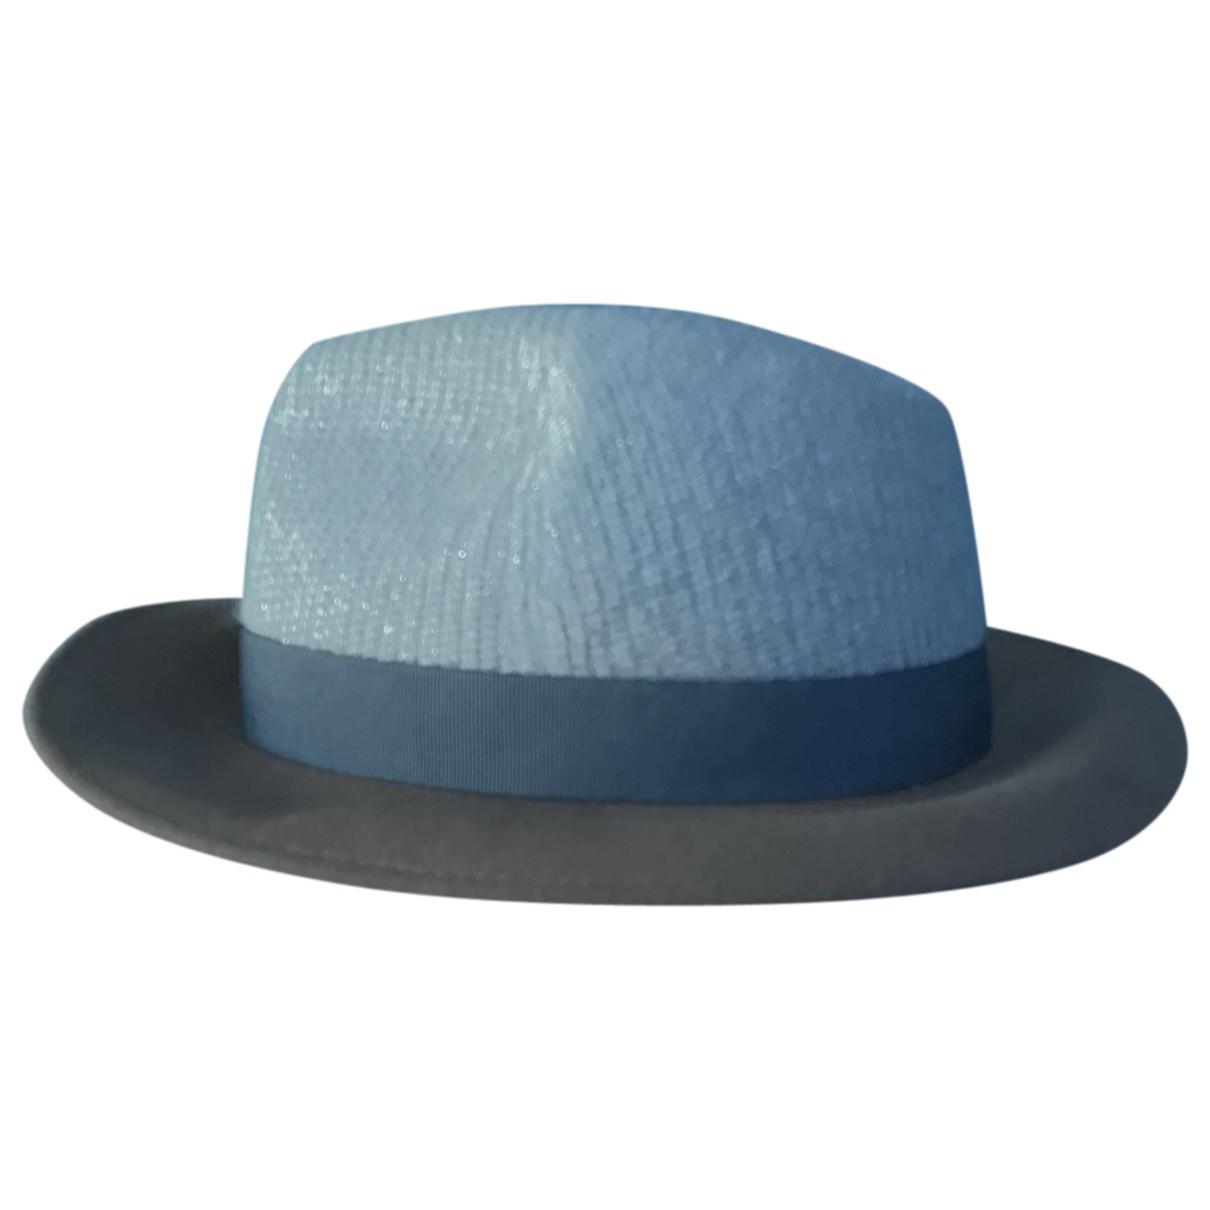 Fabiana Filippi N Multicolour Wool hat for Women L International